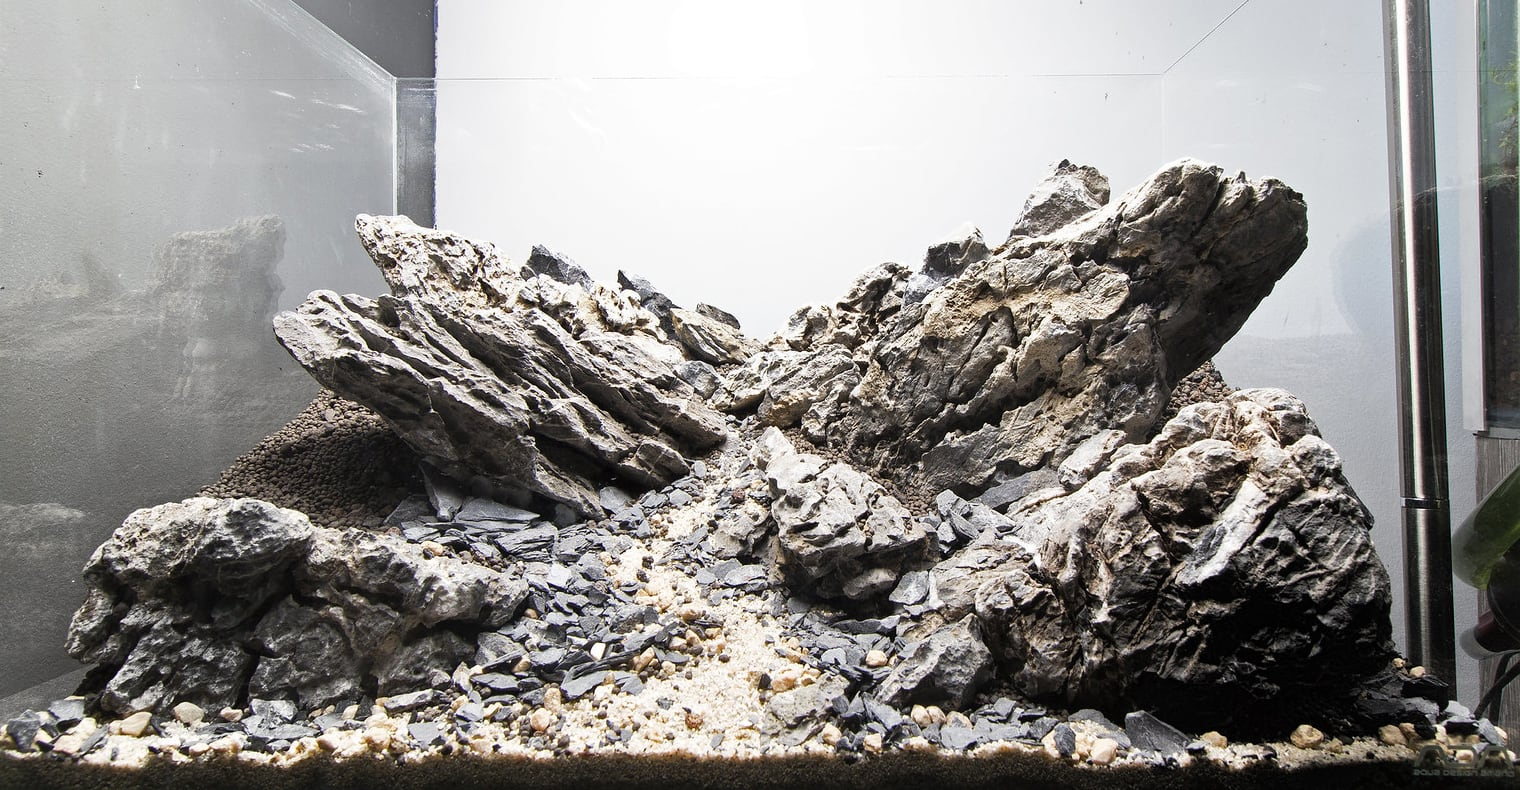 Aquascaping Rocks: Planted Aquarium Hardscape Essentials Part 2 - Aquascaping Love